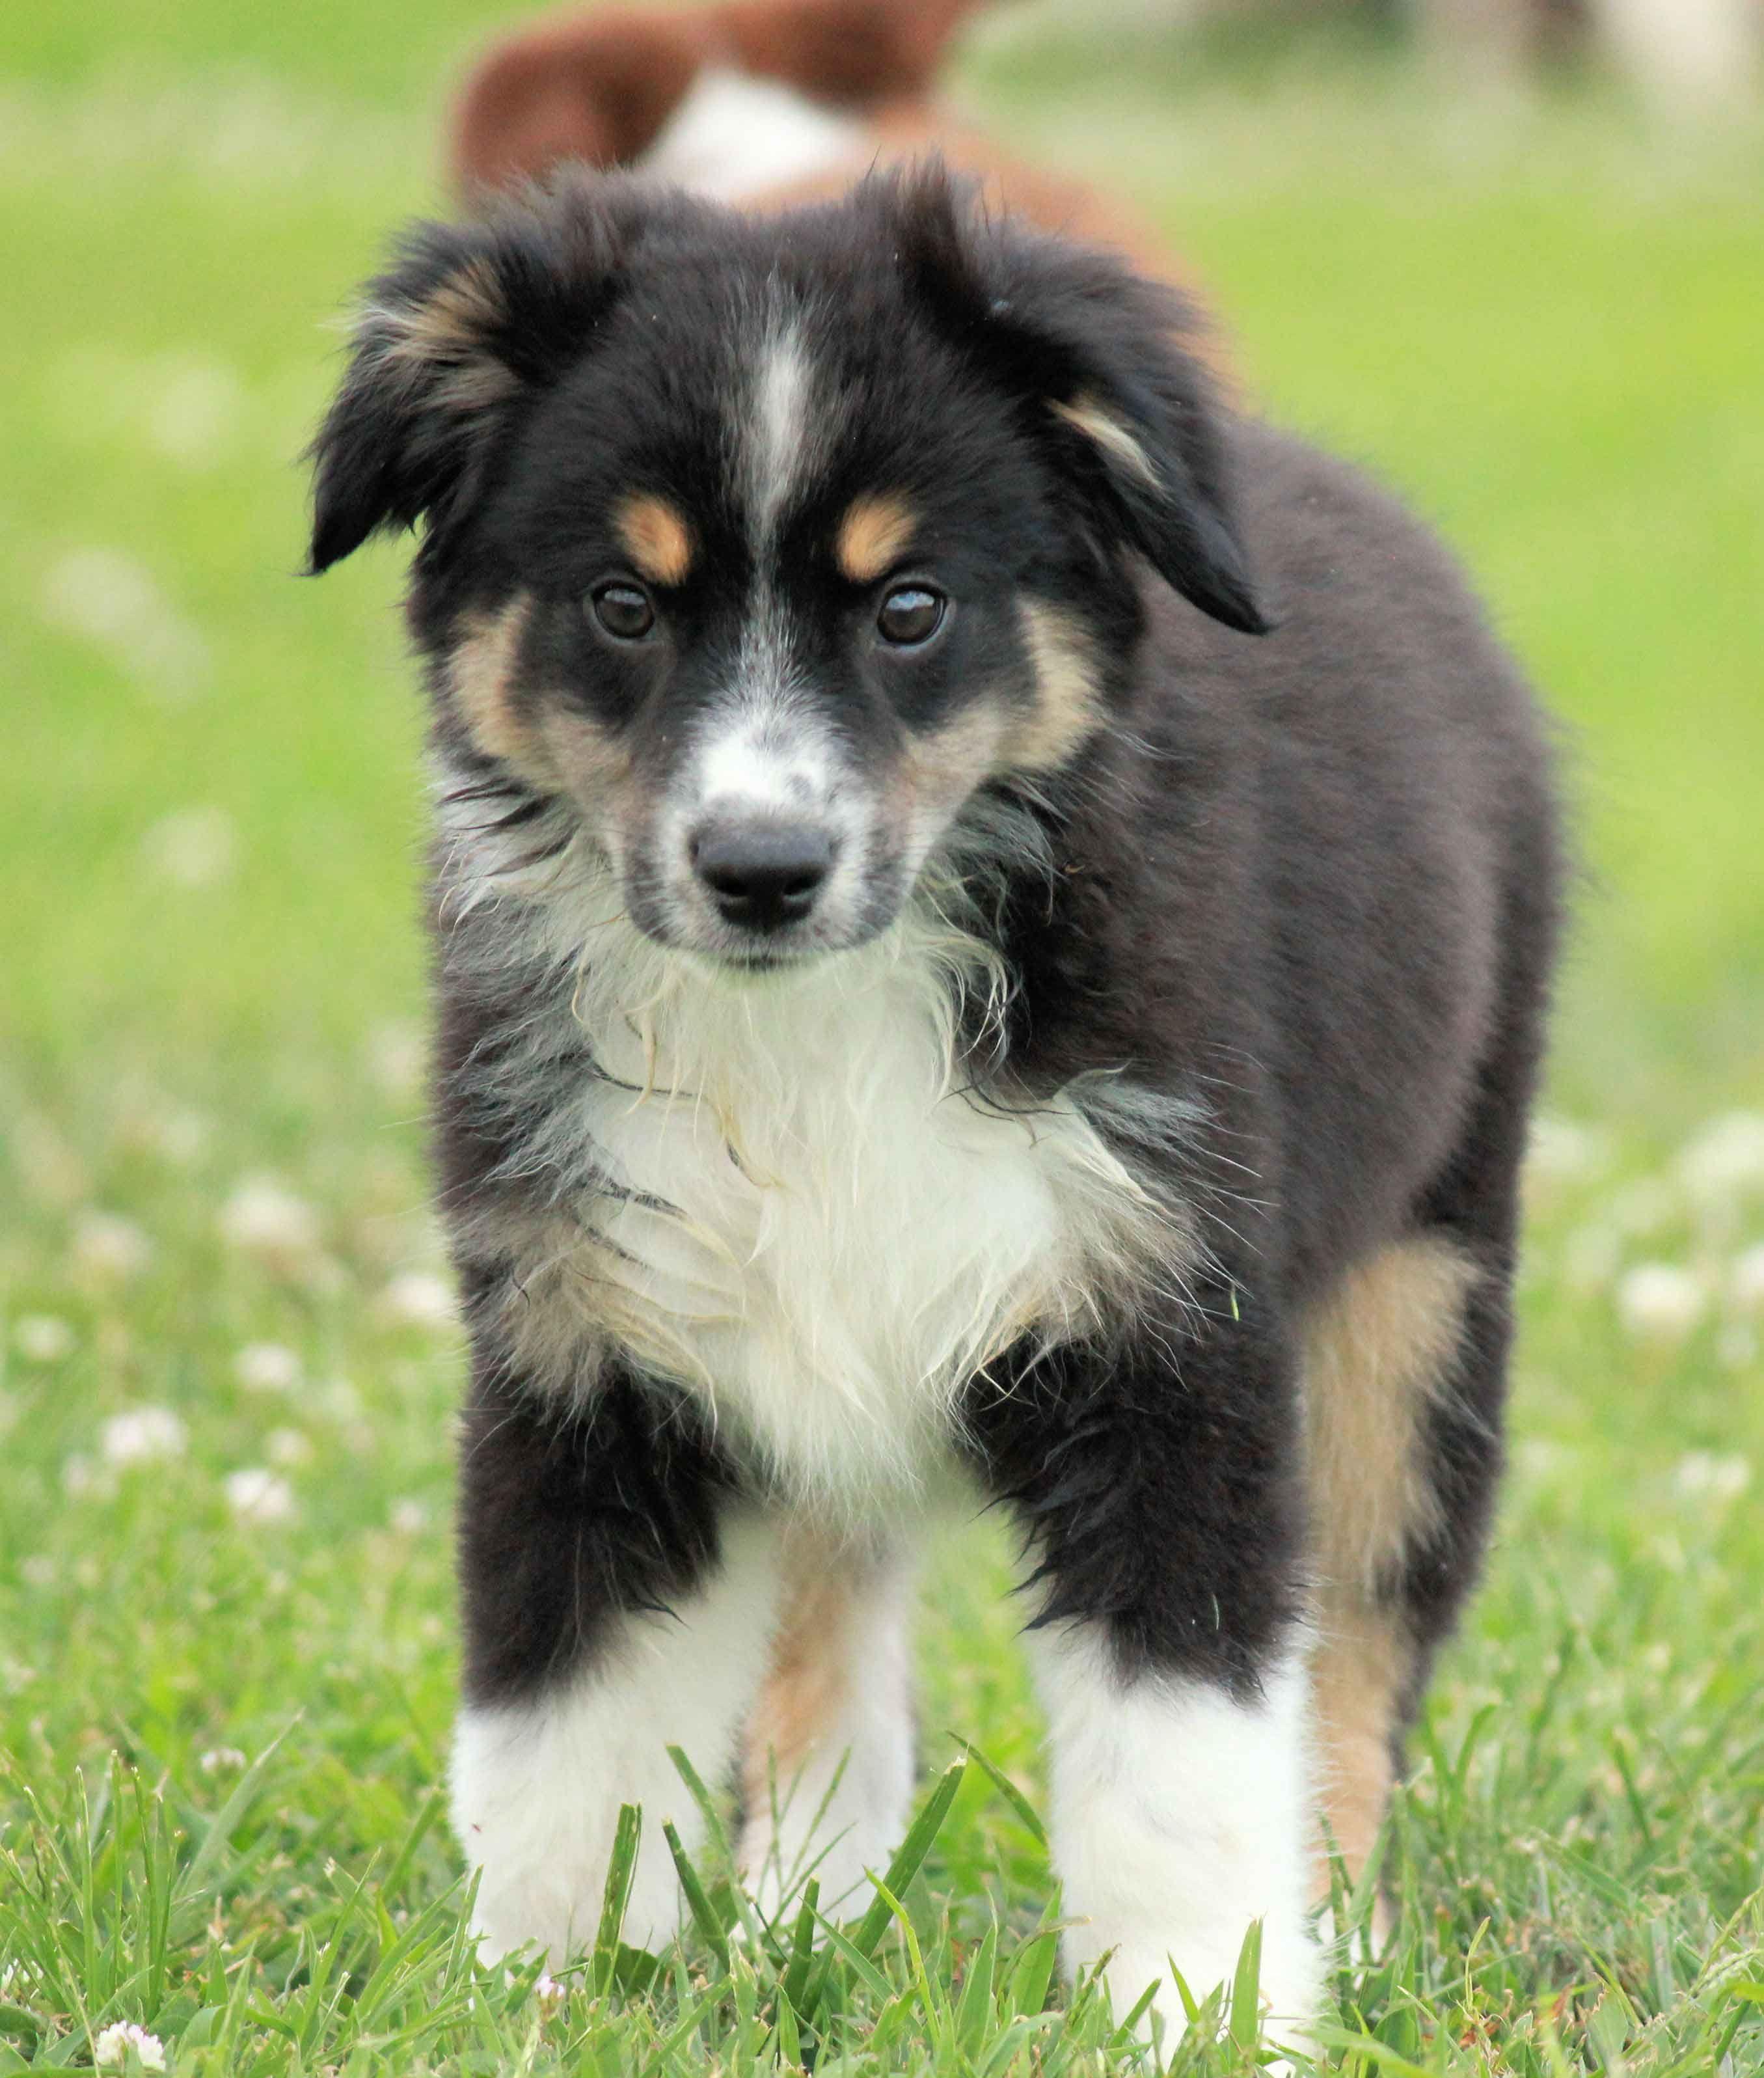 Brown Australian Shepherd Puppies Wallpaper 2 Jpg 2711 3193